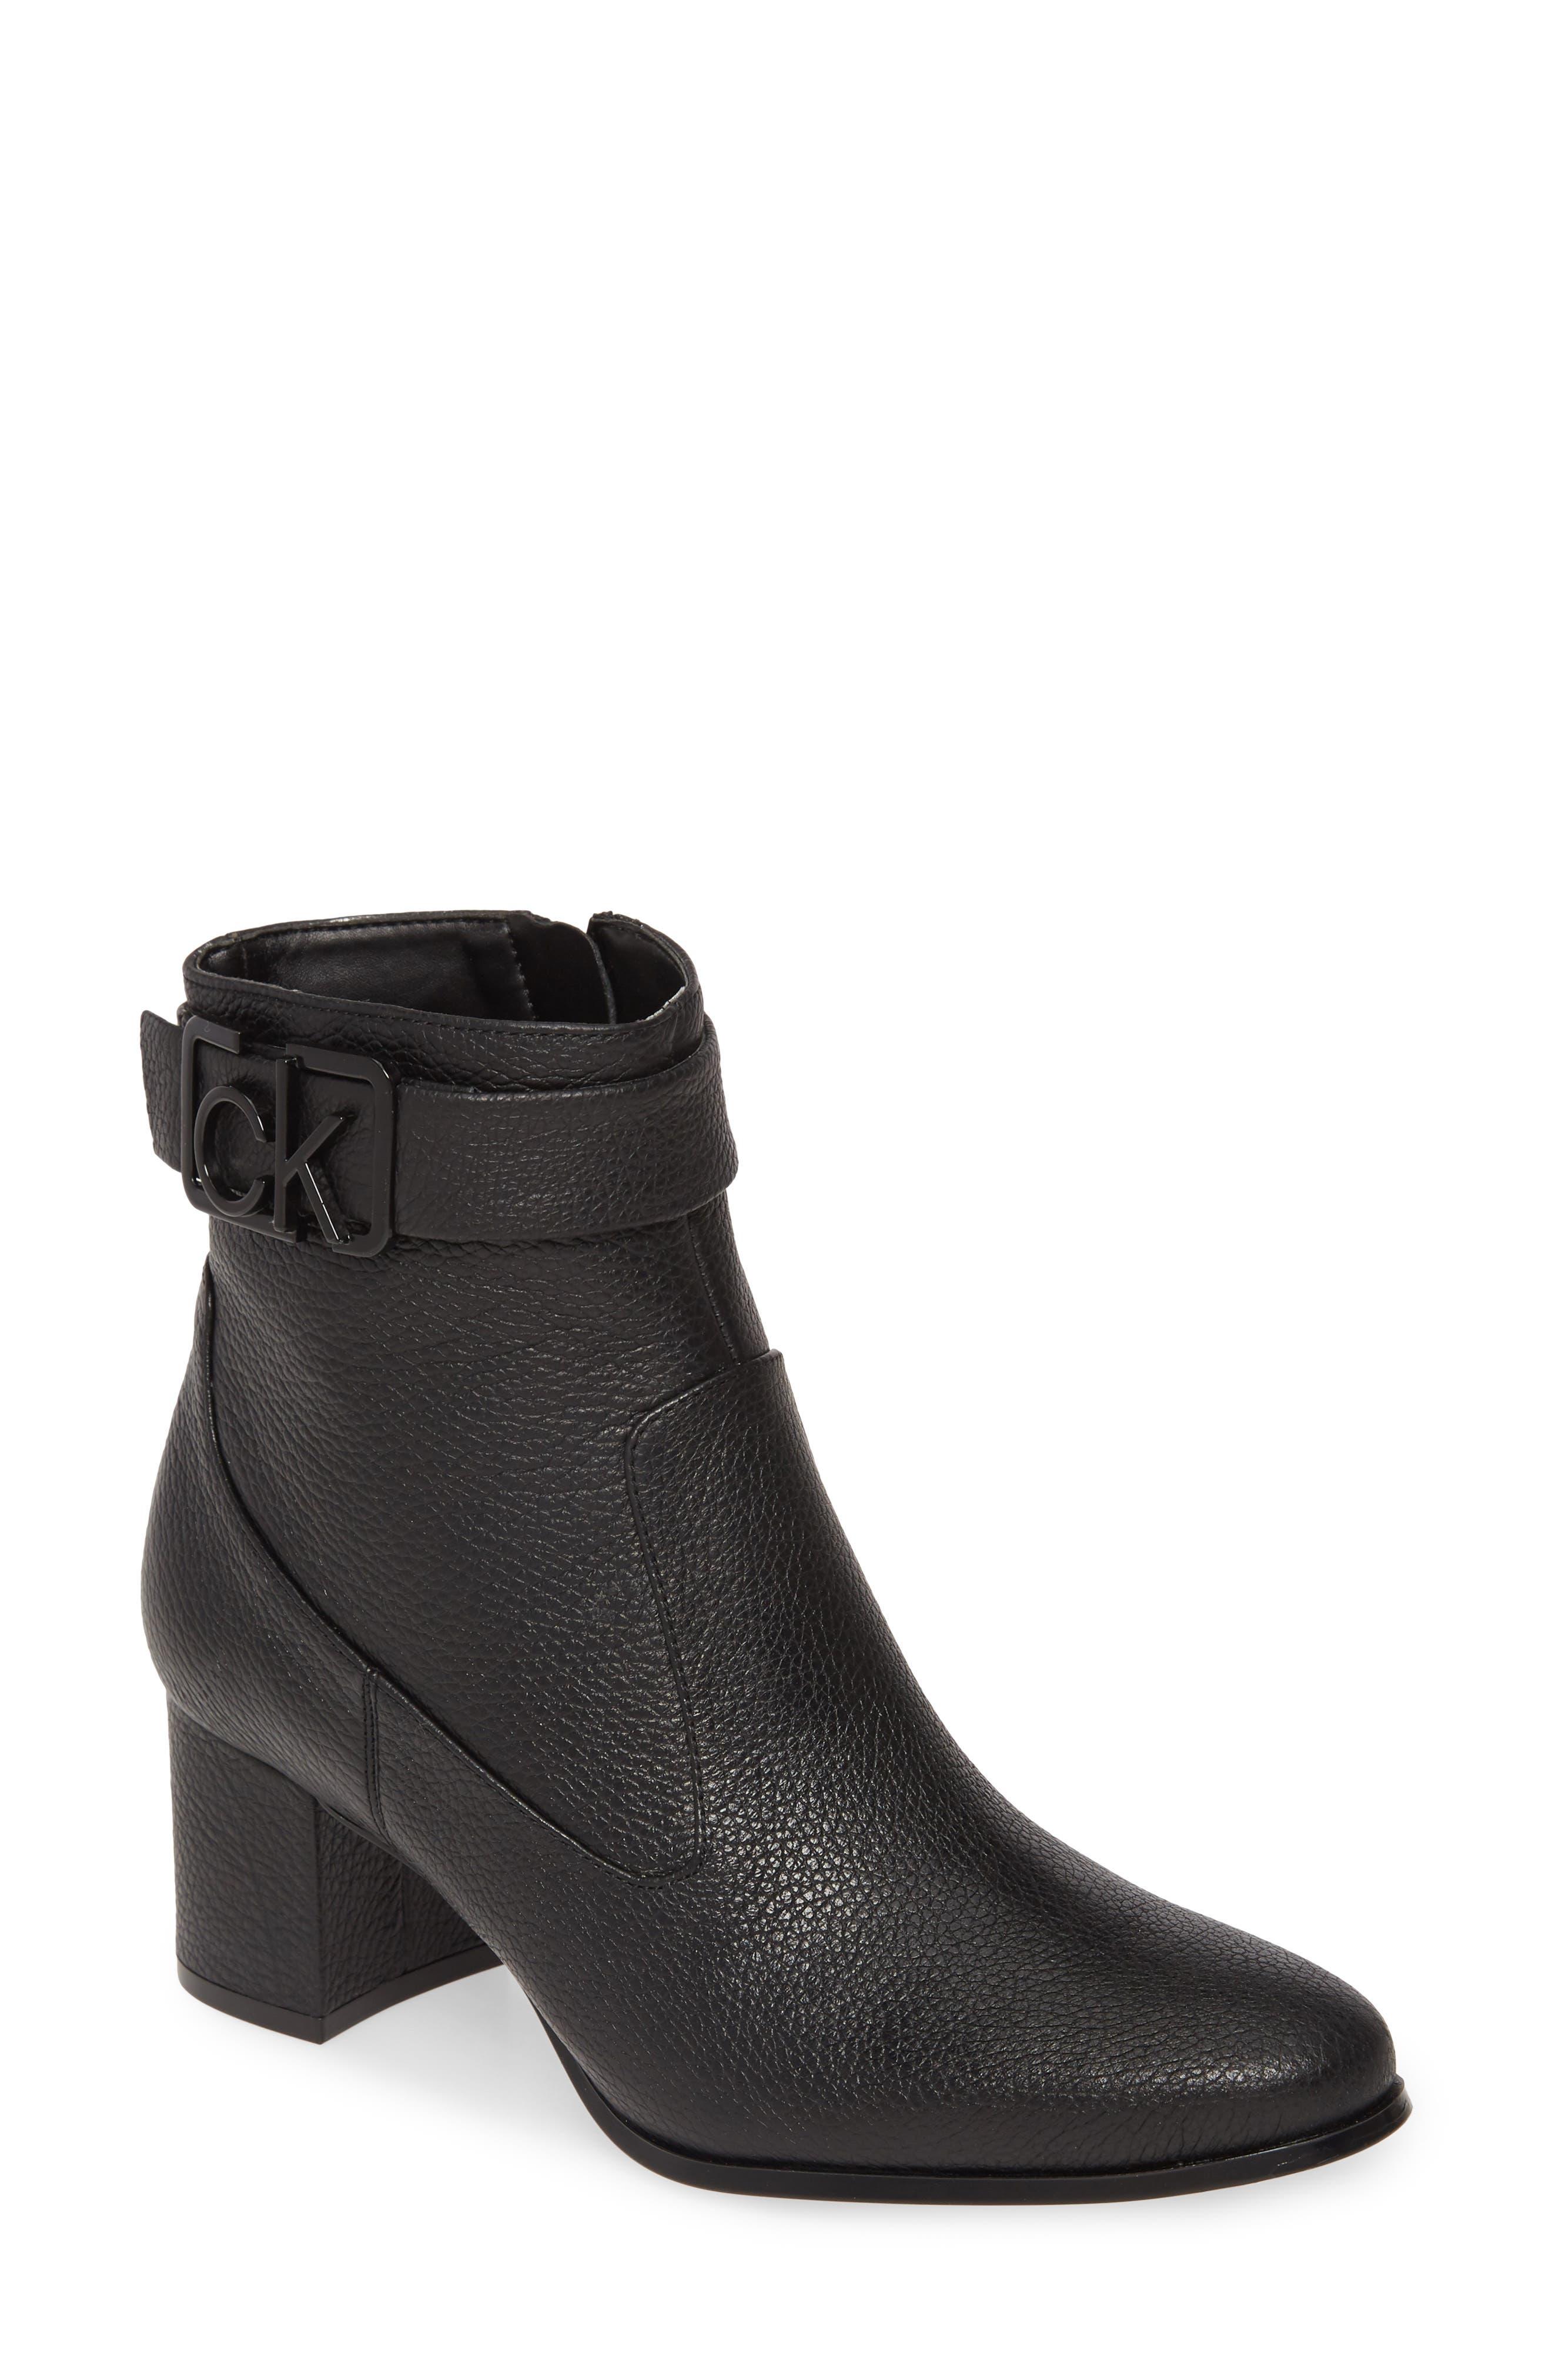 Vintage Boots- Buy Winter Retro Boots Womens Calvin Klein Freema Bootie $149.95 AT vintagedancer.com